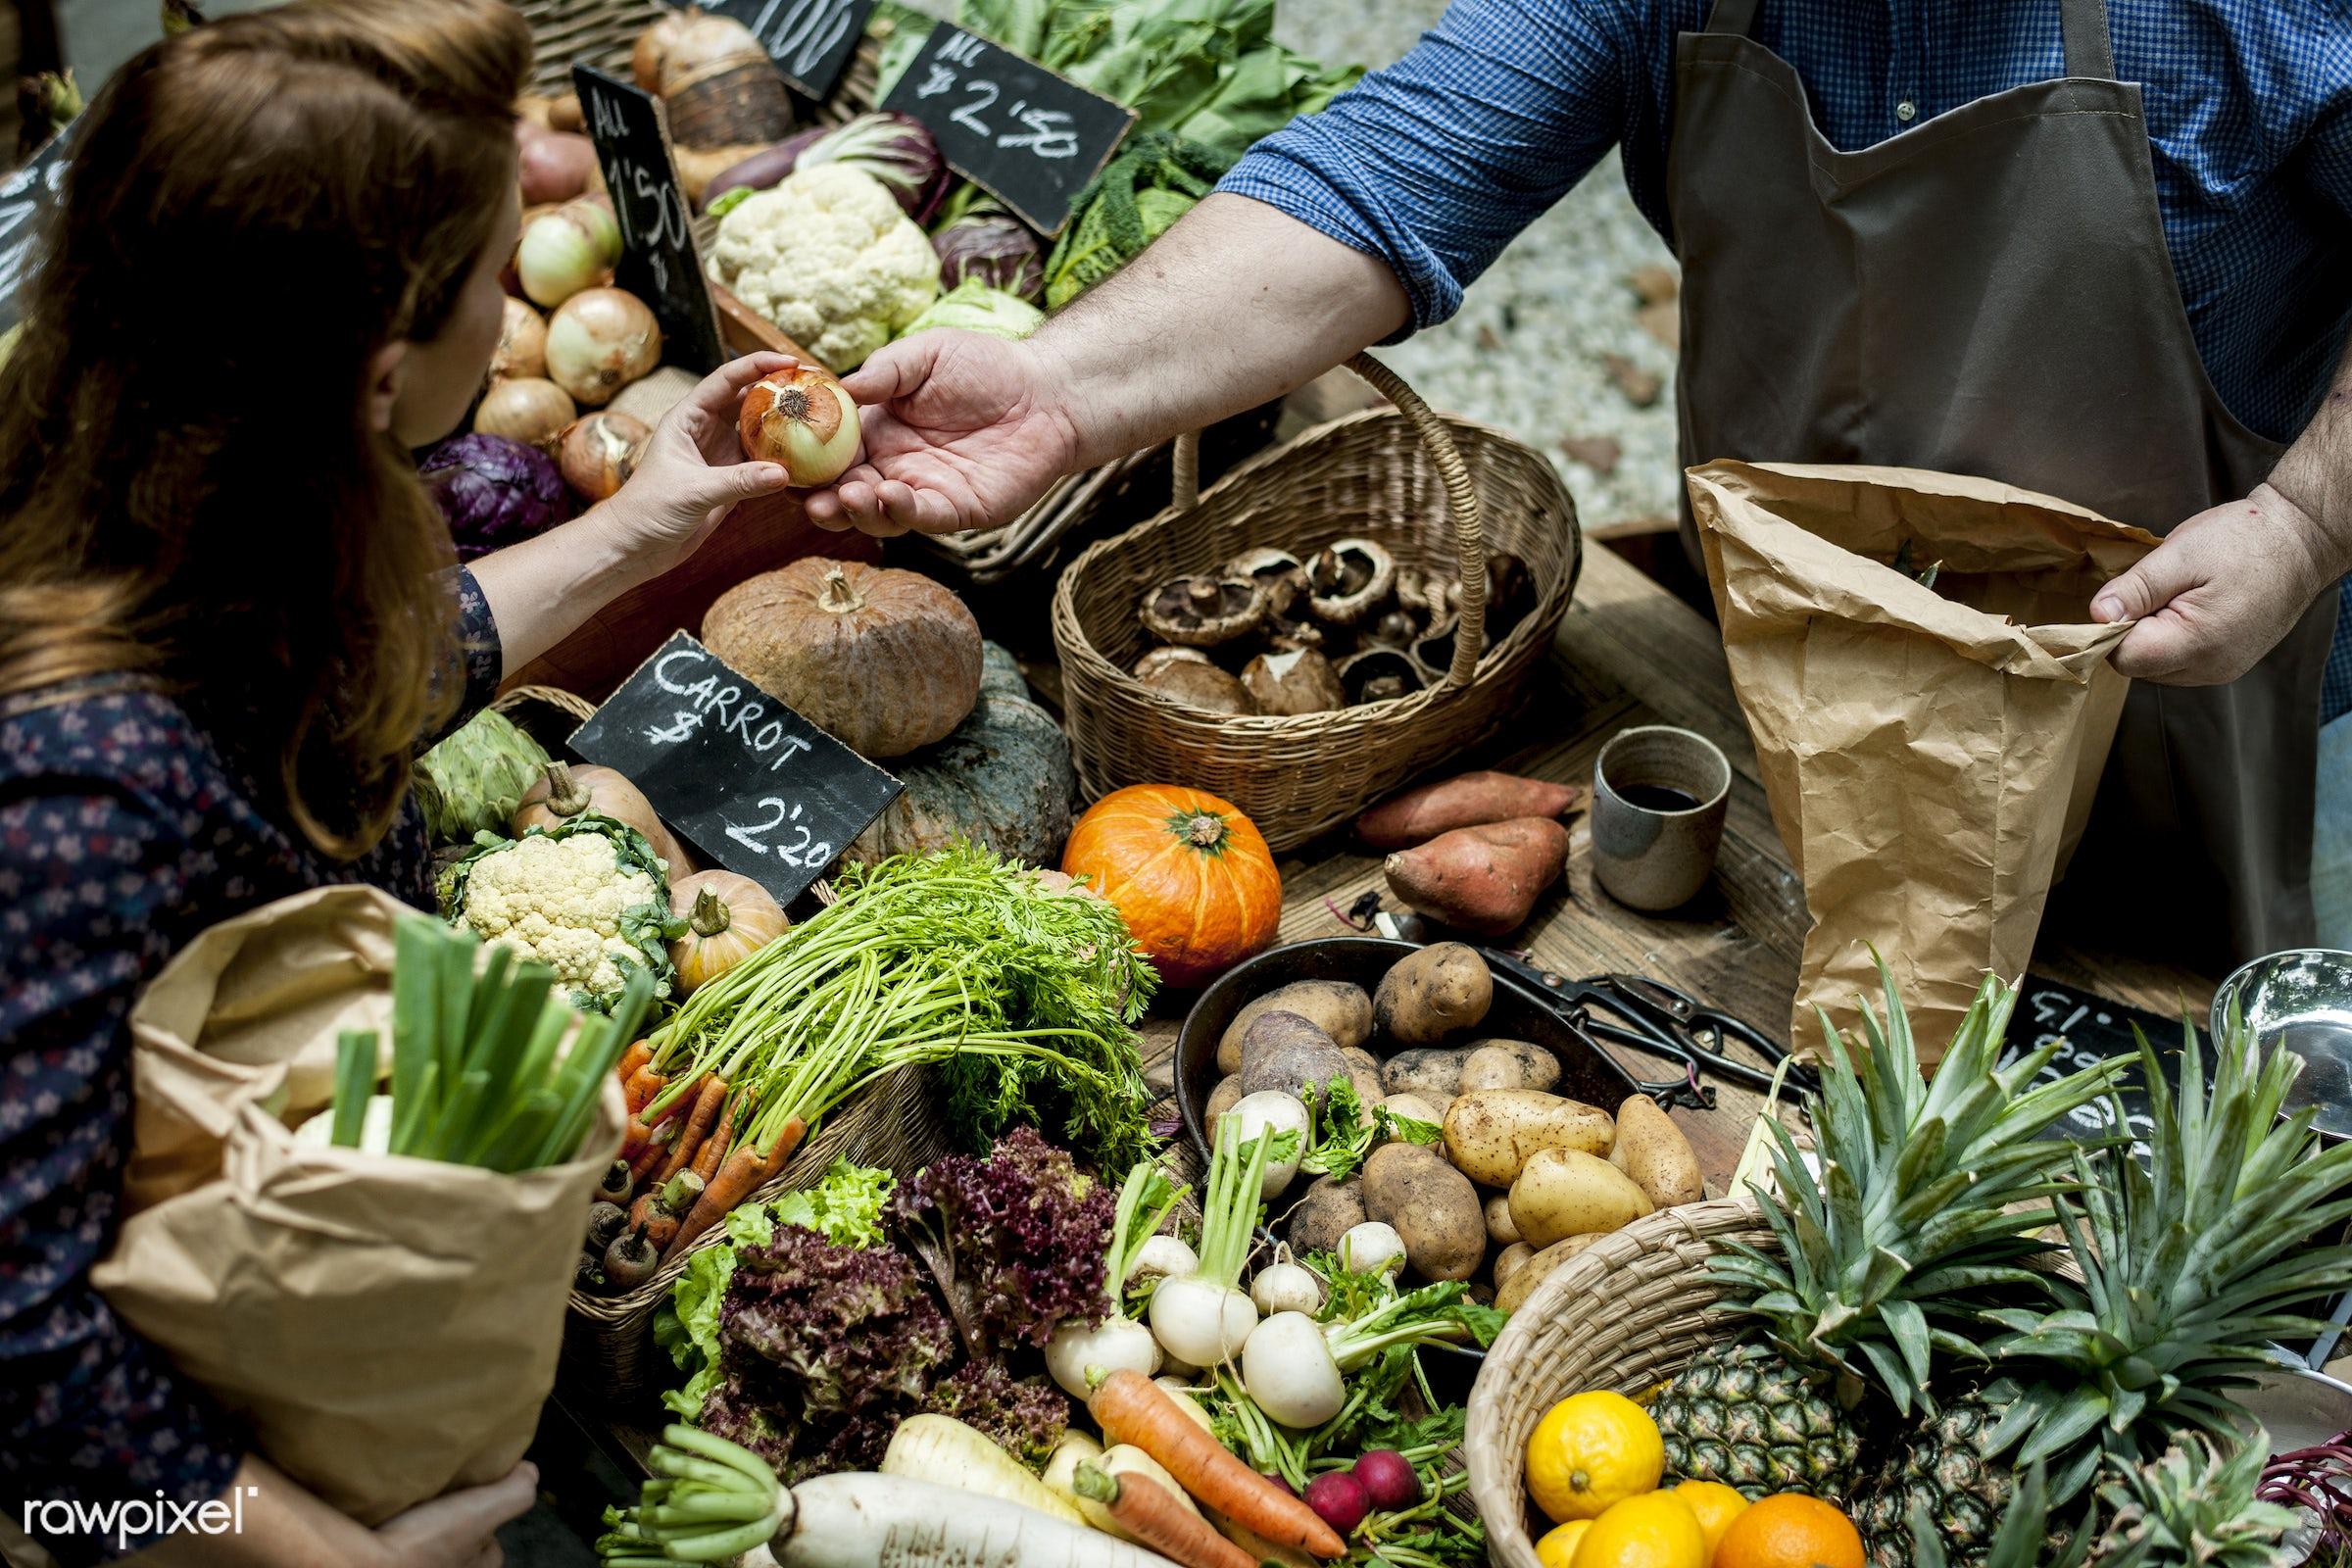 raw, diverse, buy, caucasian, farm, ingredients, farmer, nature, fresh, choosing, wooden basket, products, onion,...